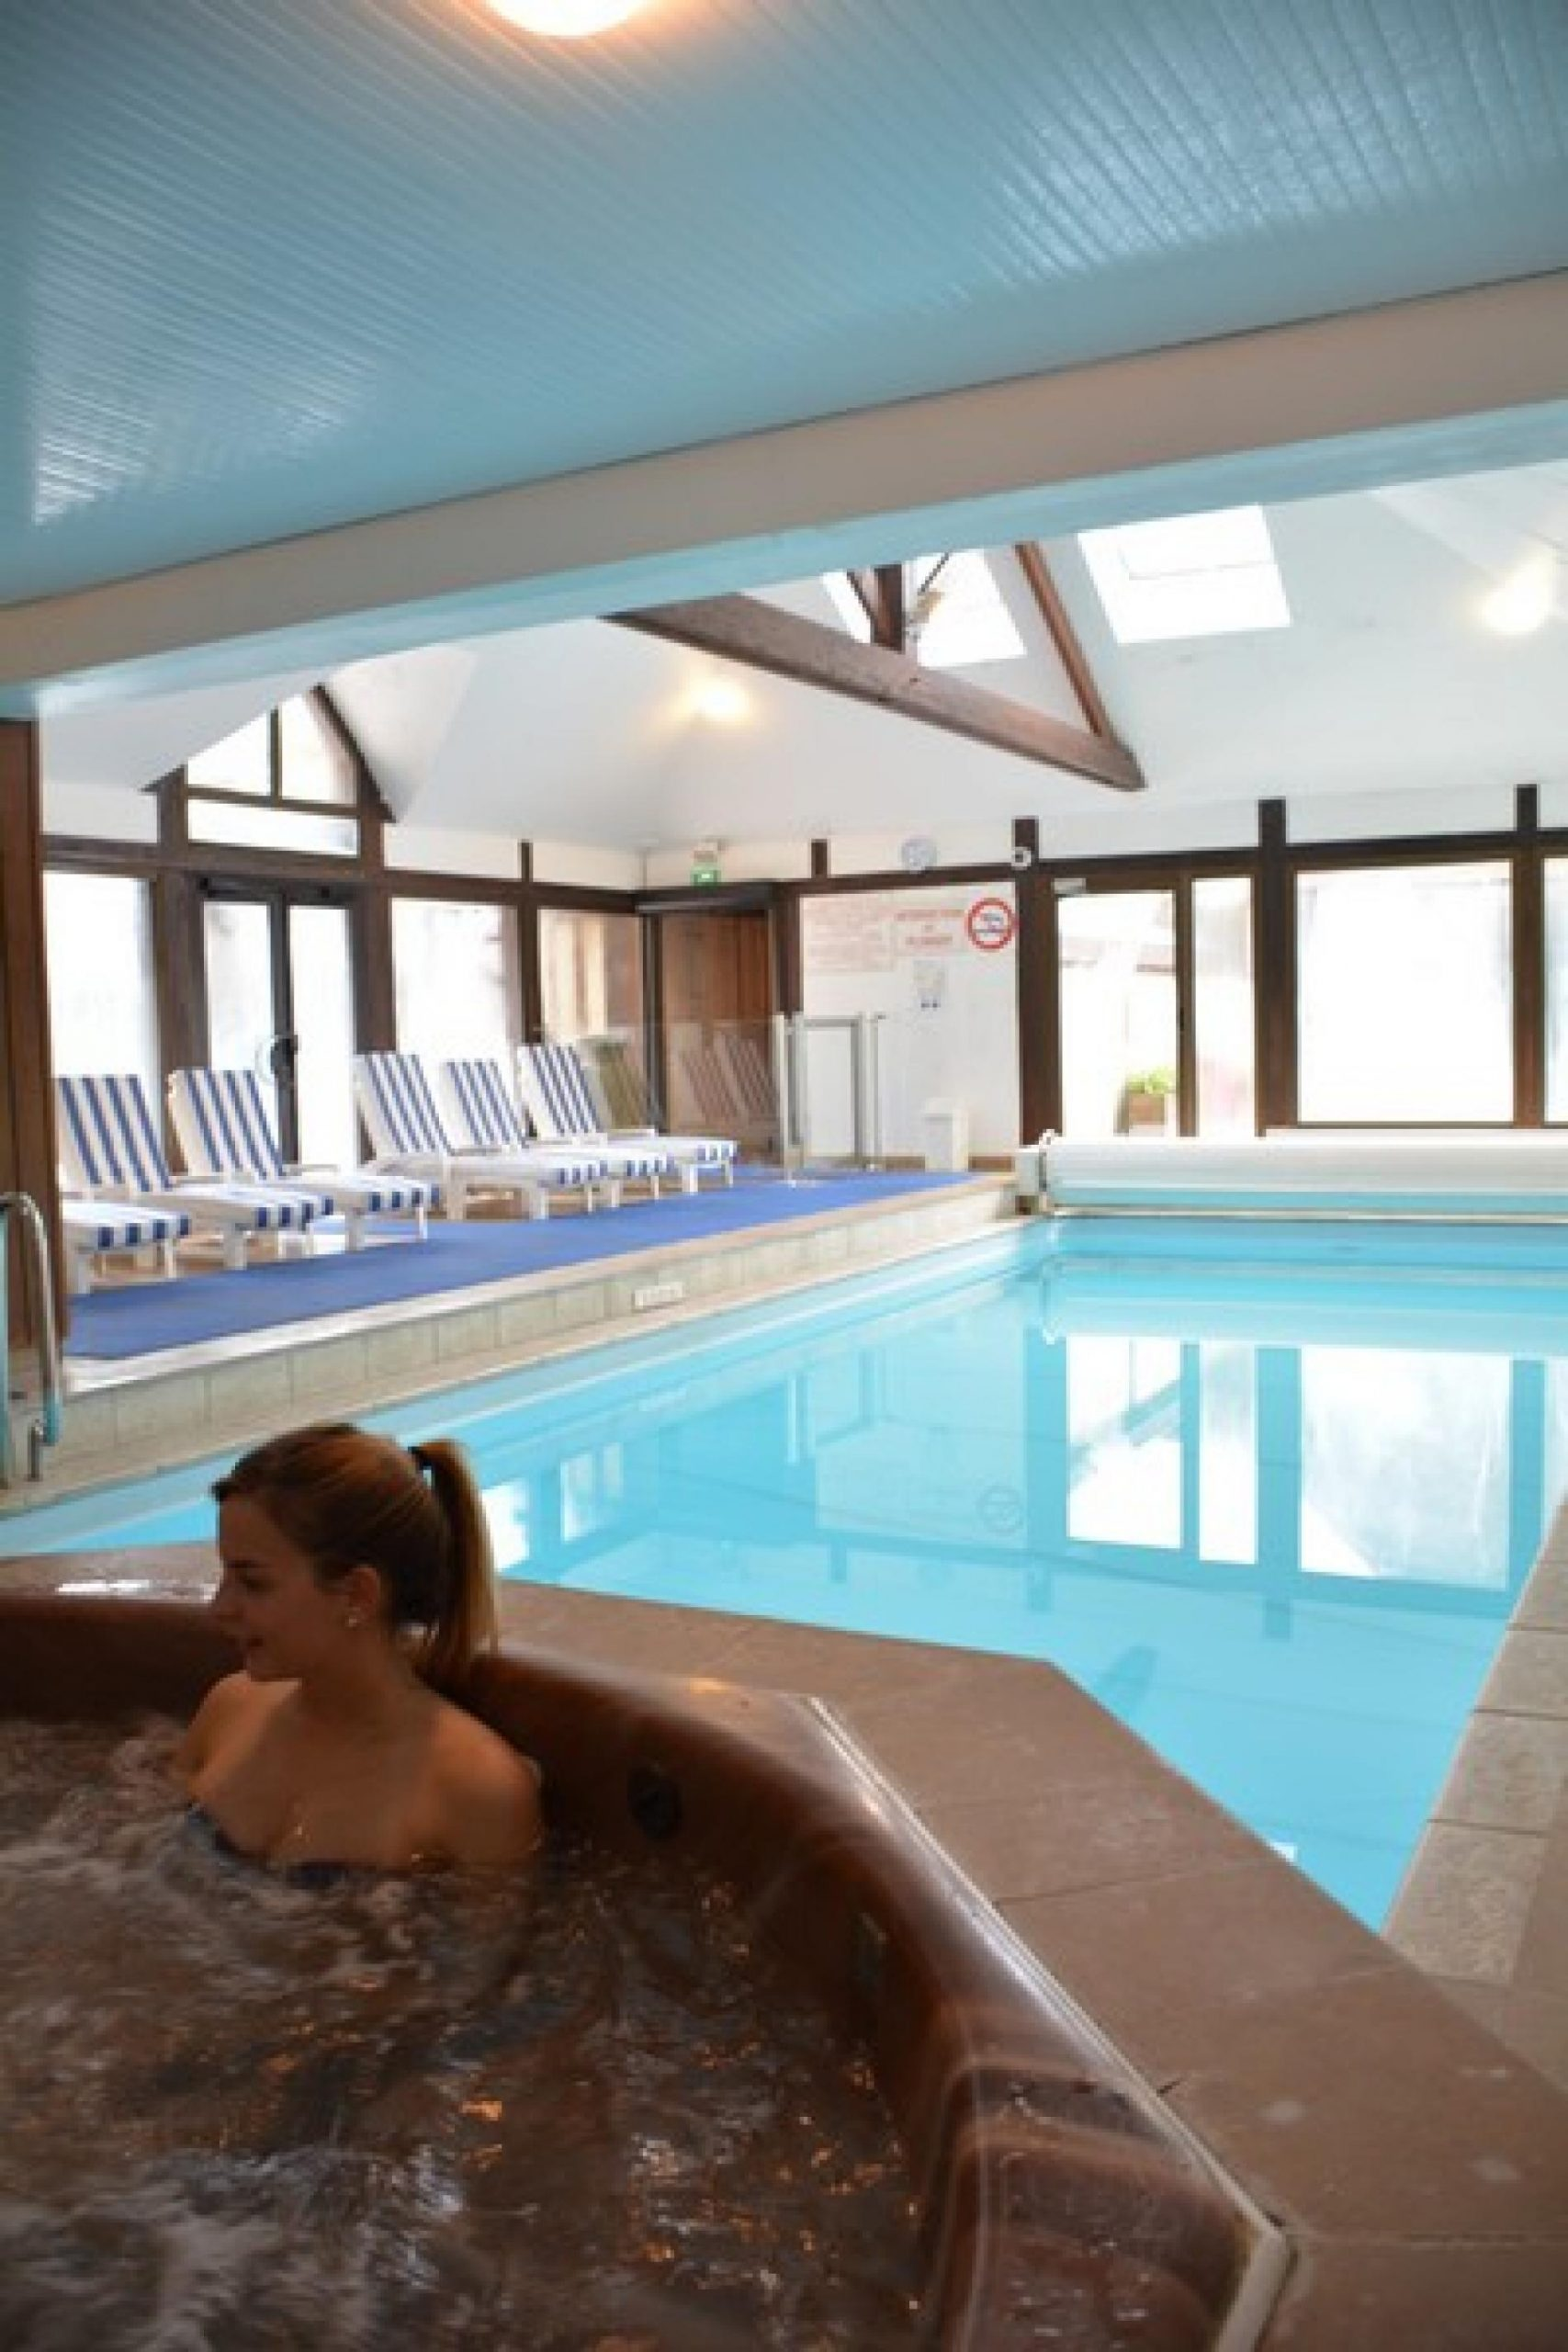 ∞ Hotel Deauville Avec Piscine - Hotel 3 Étoiles Deauville ... serapportantà Horaires Piscine Deauville